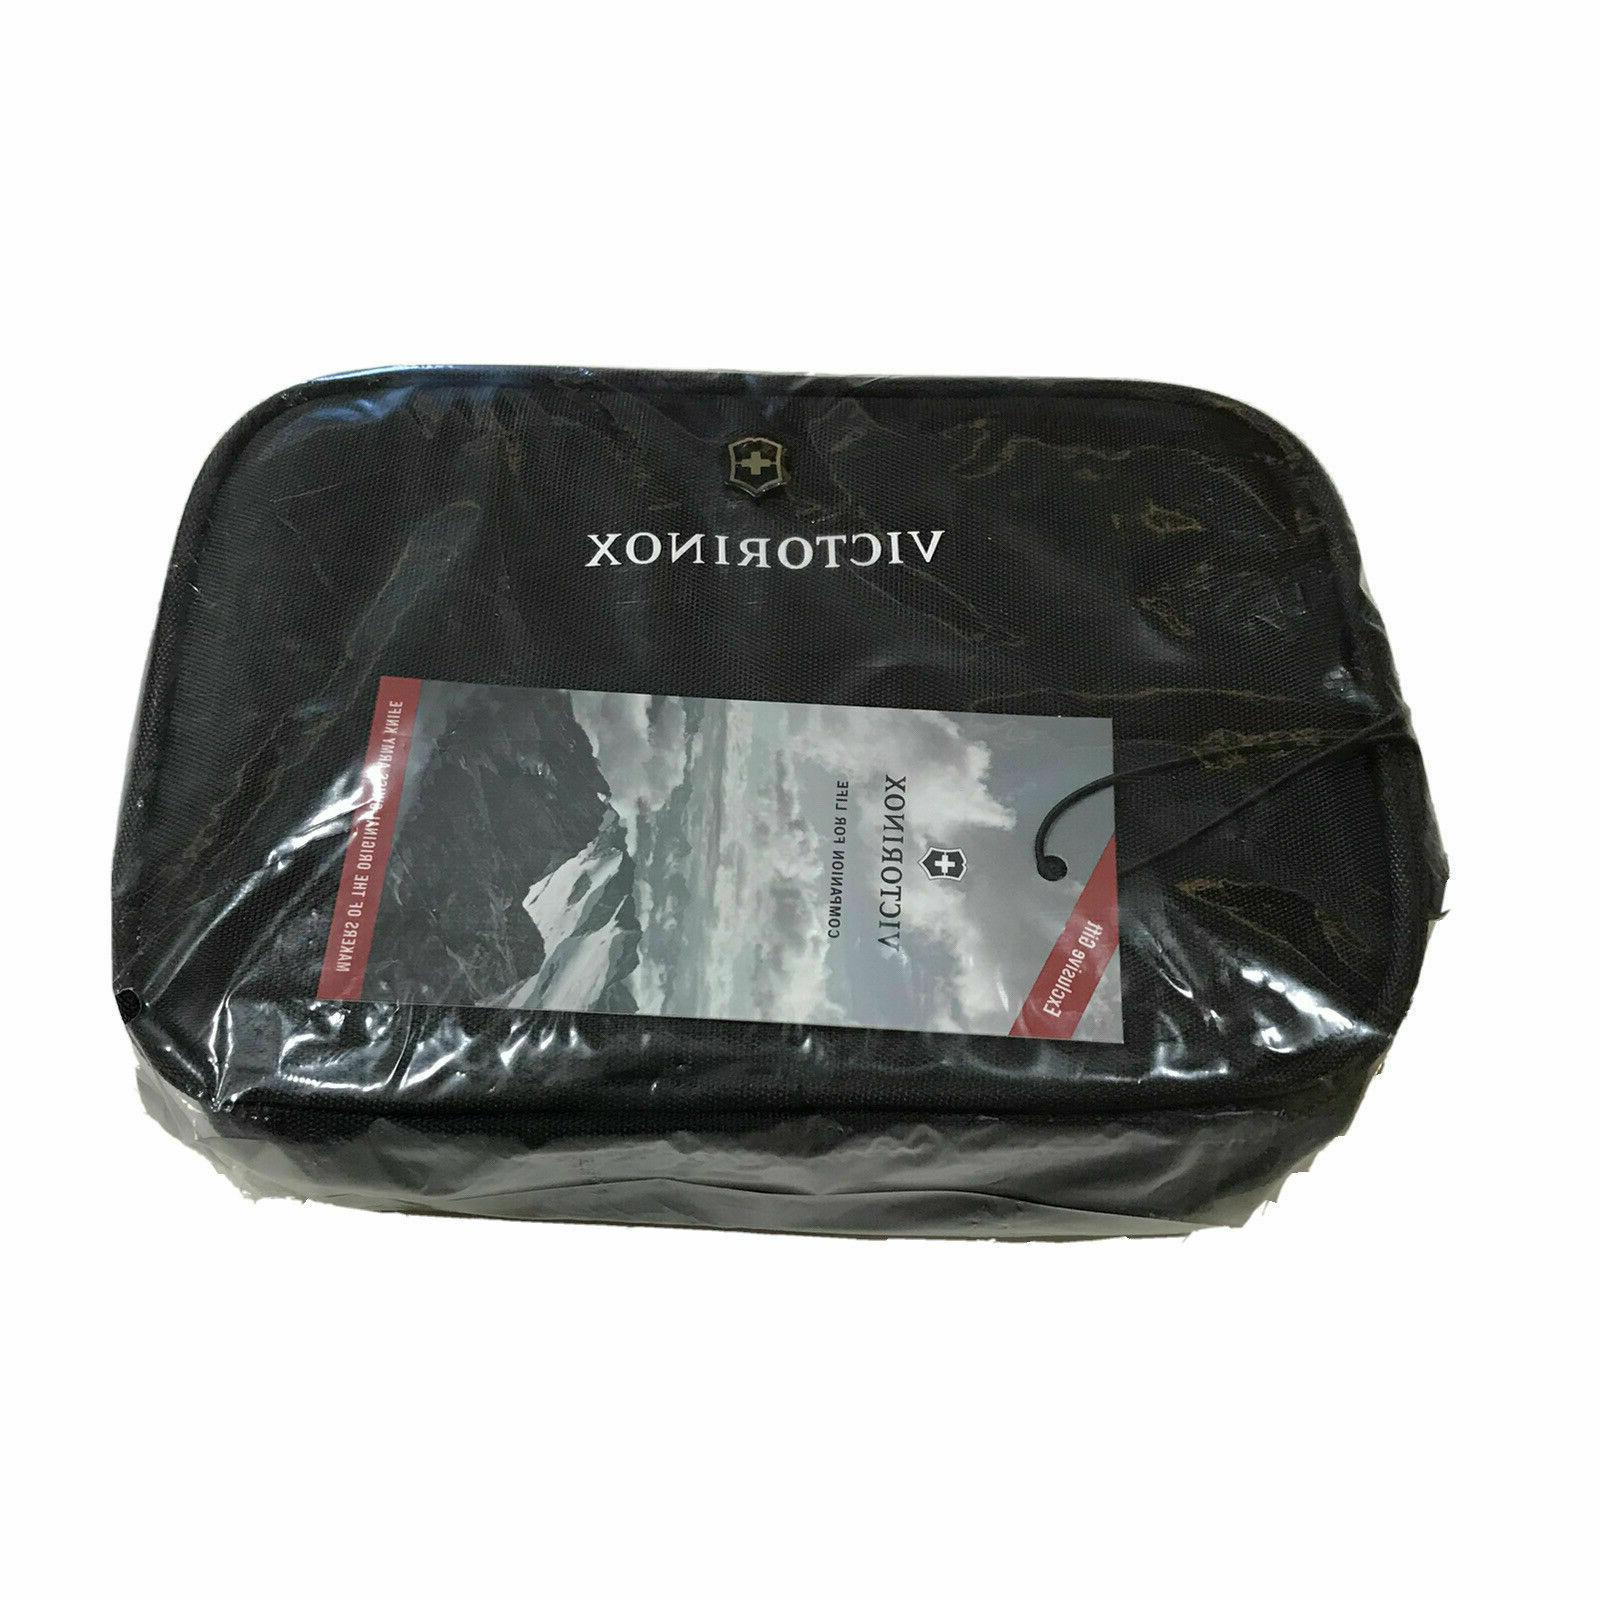 Victorinox Bag Small Bathroom Gear